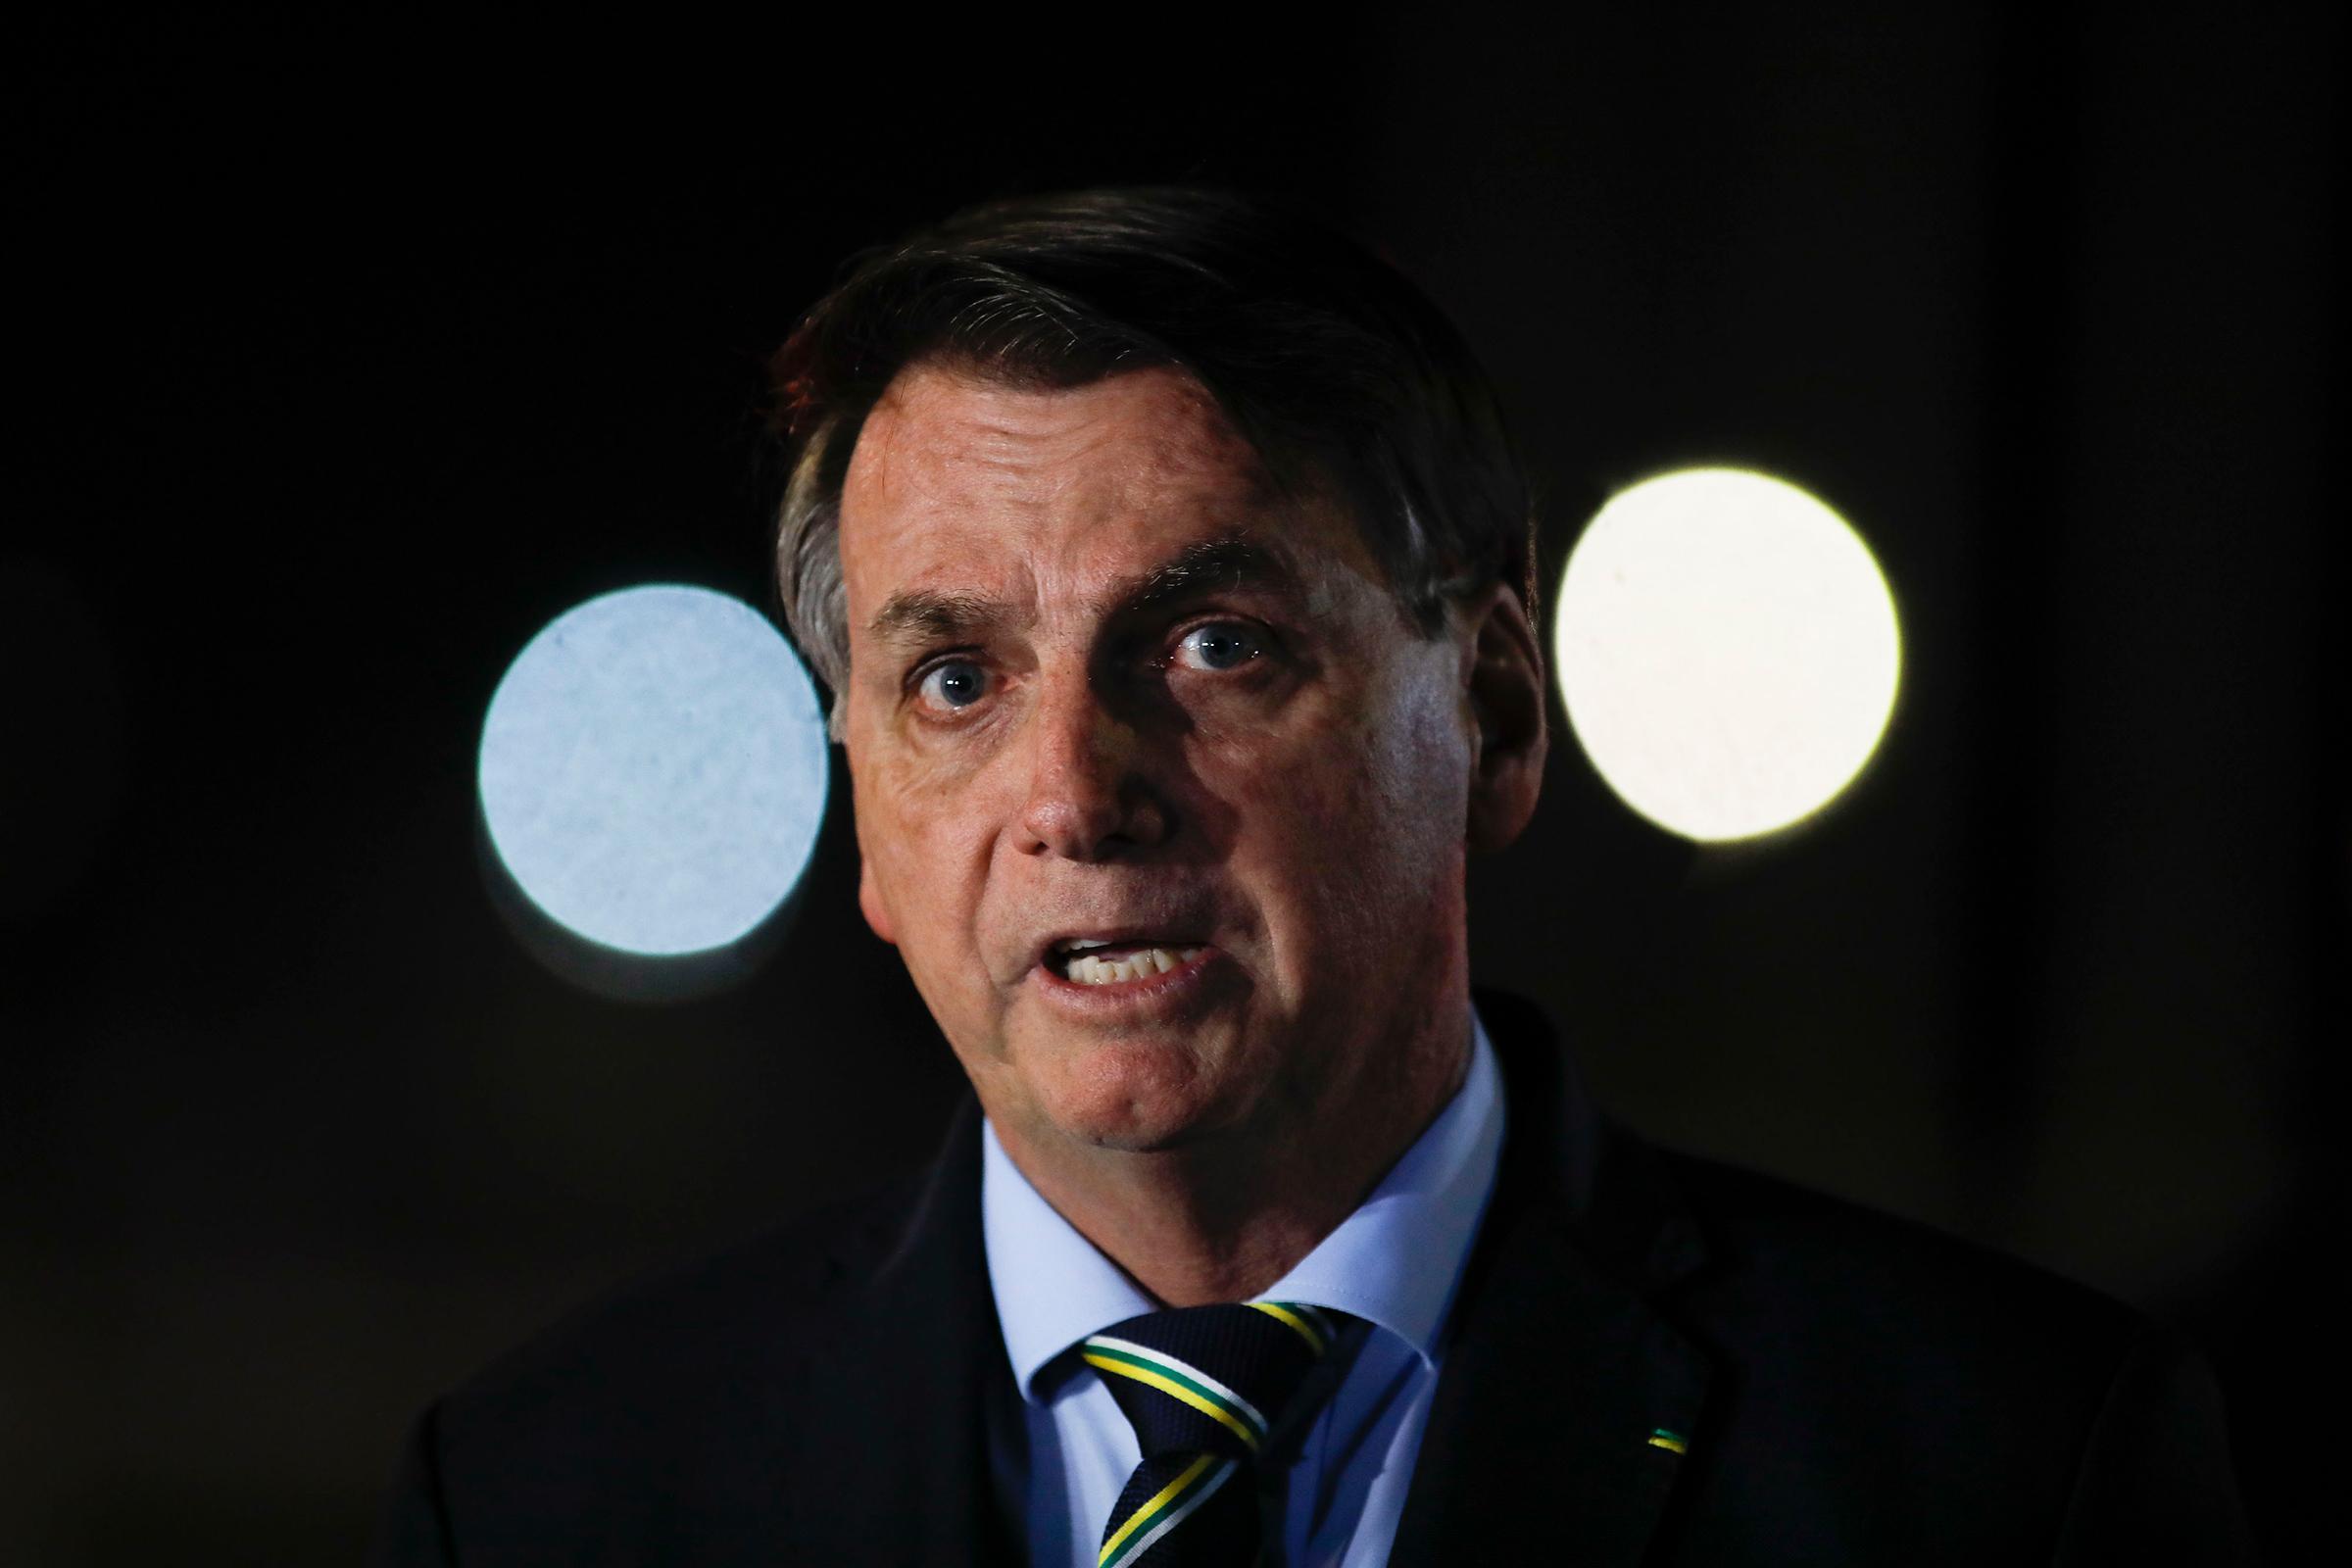 Brazil's President Jair Bolsonaro delivers a  press conference at Palacio da Alvorada da presidencial residence on April 16